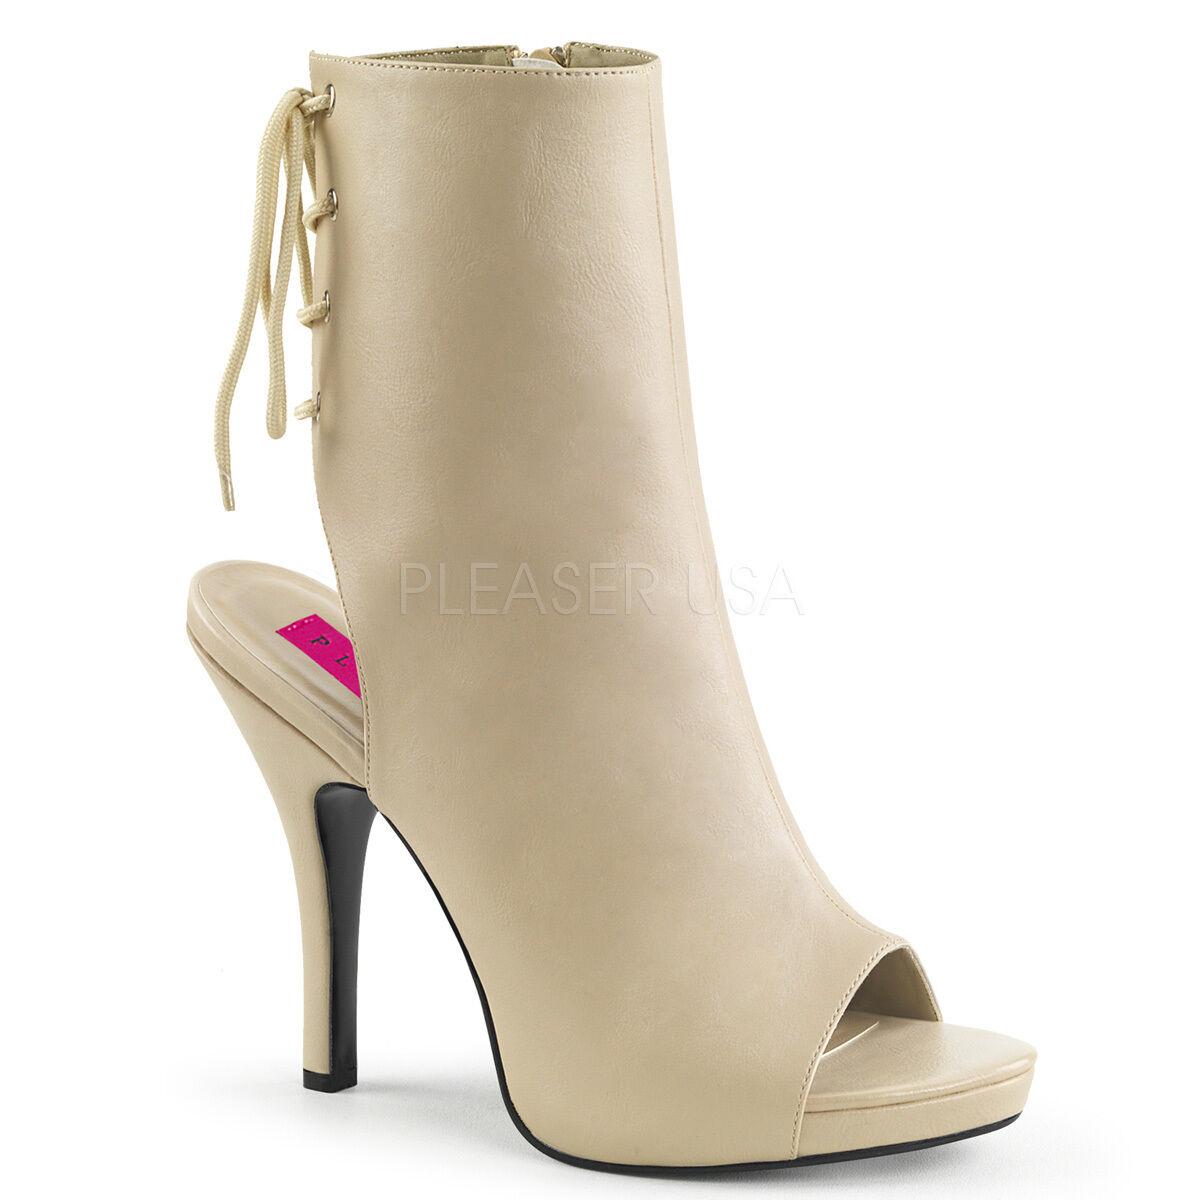 Eve 102 Queen Größe 9-16 Open Toe Ankle Boot Cream Lederette 5